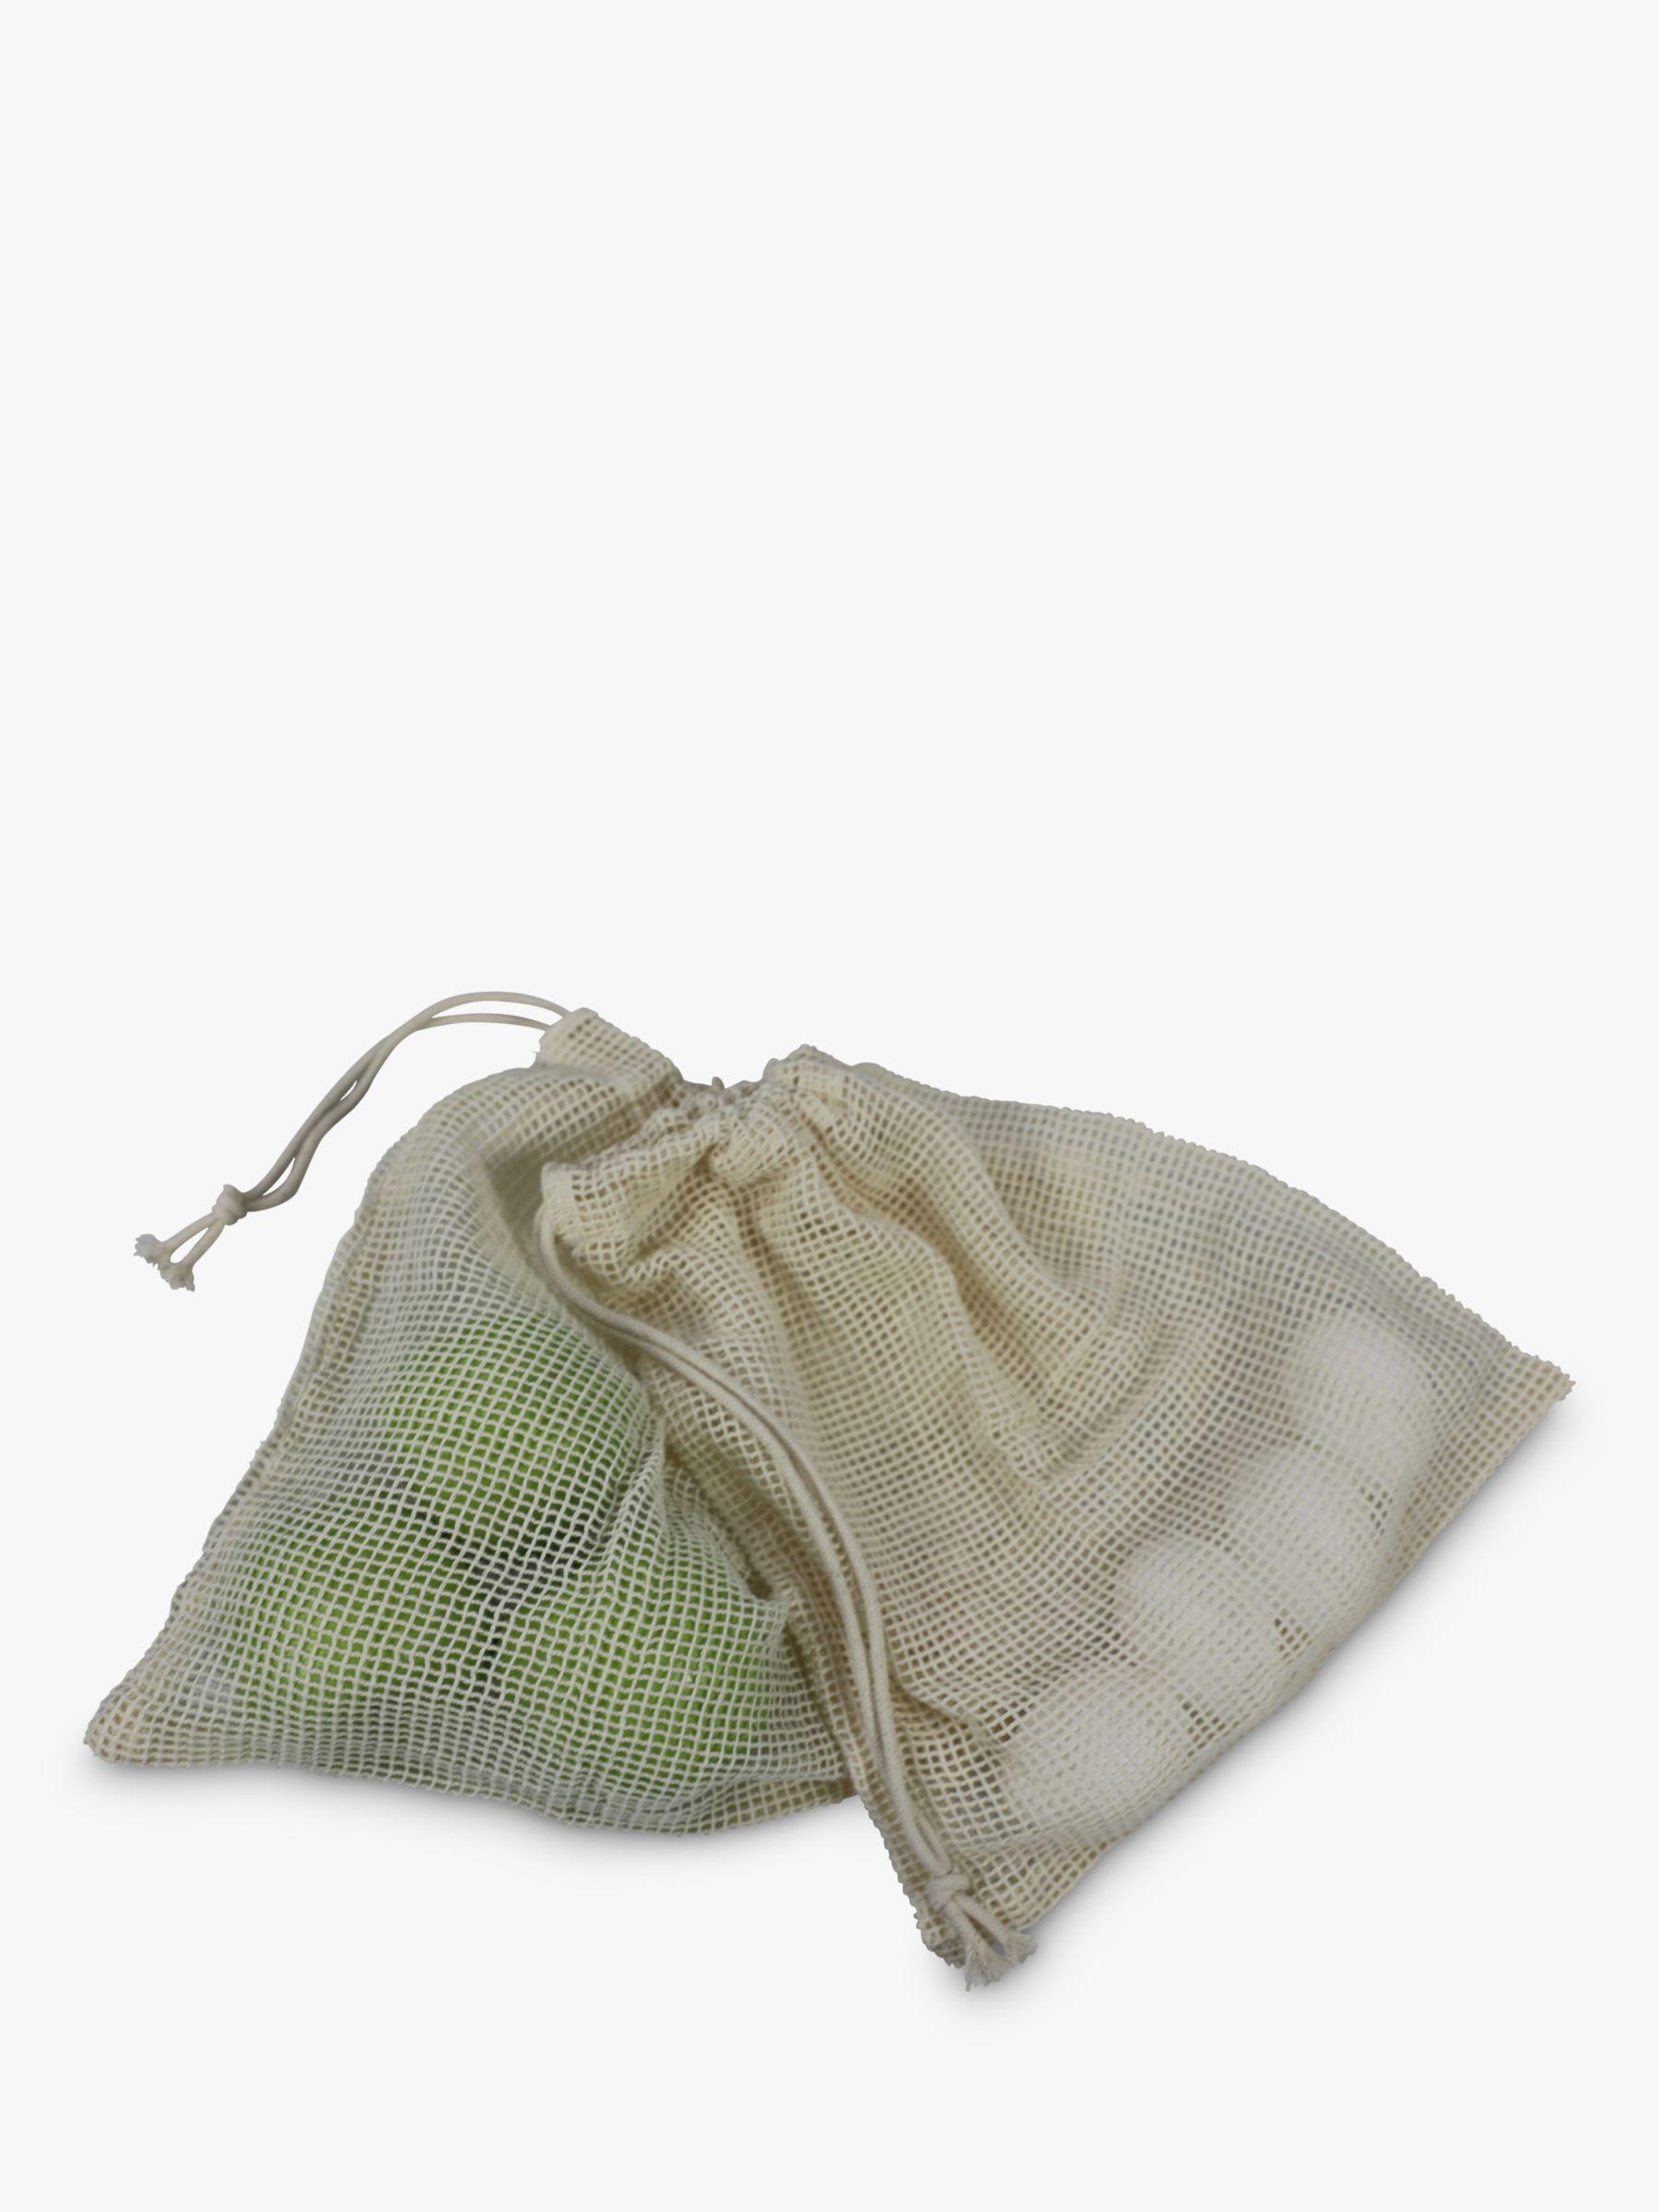 Dexam Dexam Organic Cotton Reusable Mesh Fruit & Vegetable Bags, Pack of 3, Natural